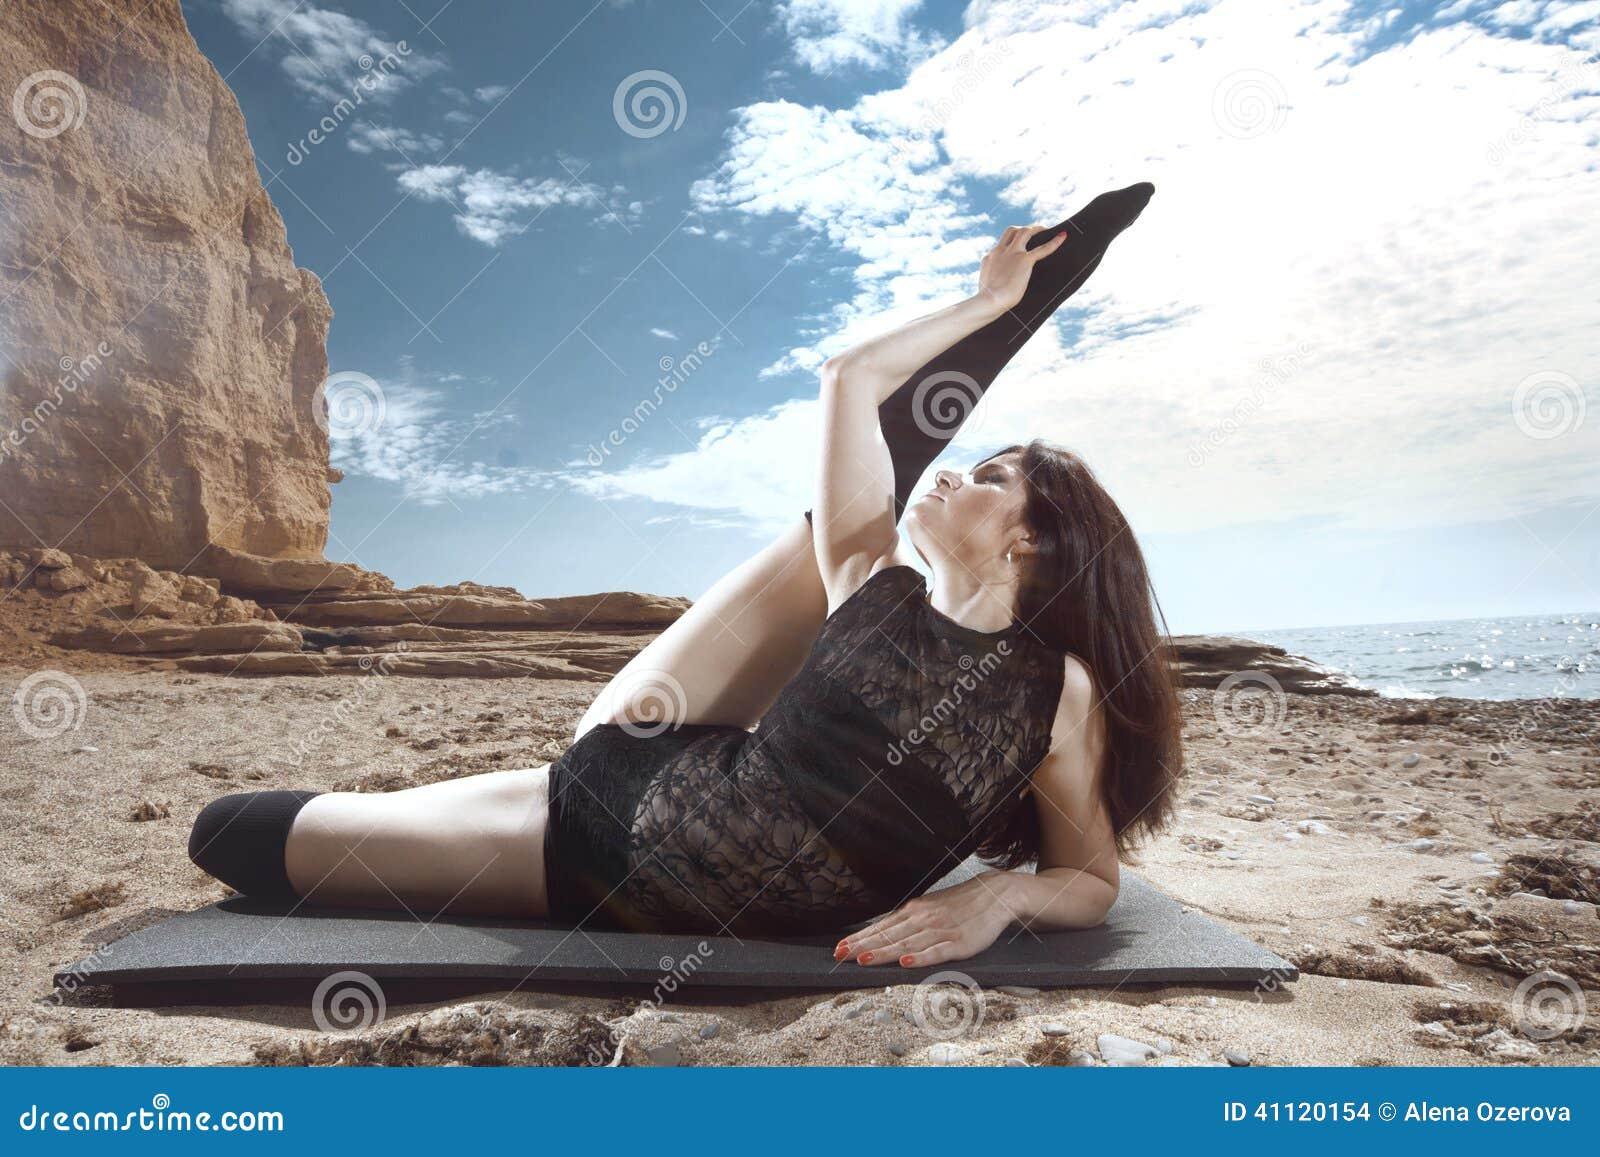 Nude Naked Gymnast Doing Split HD